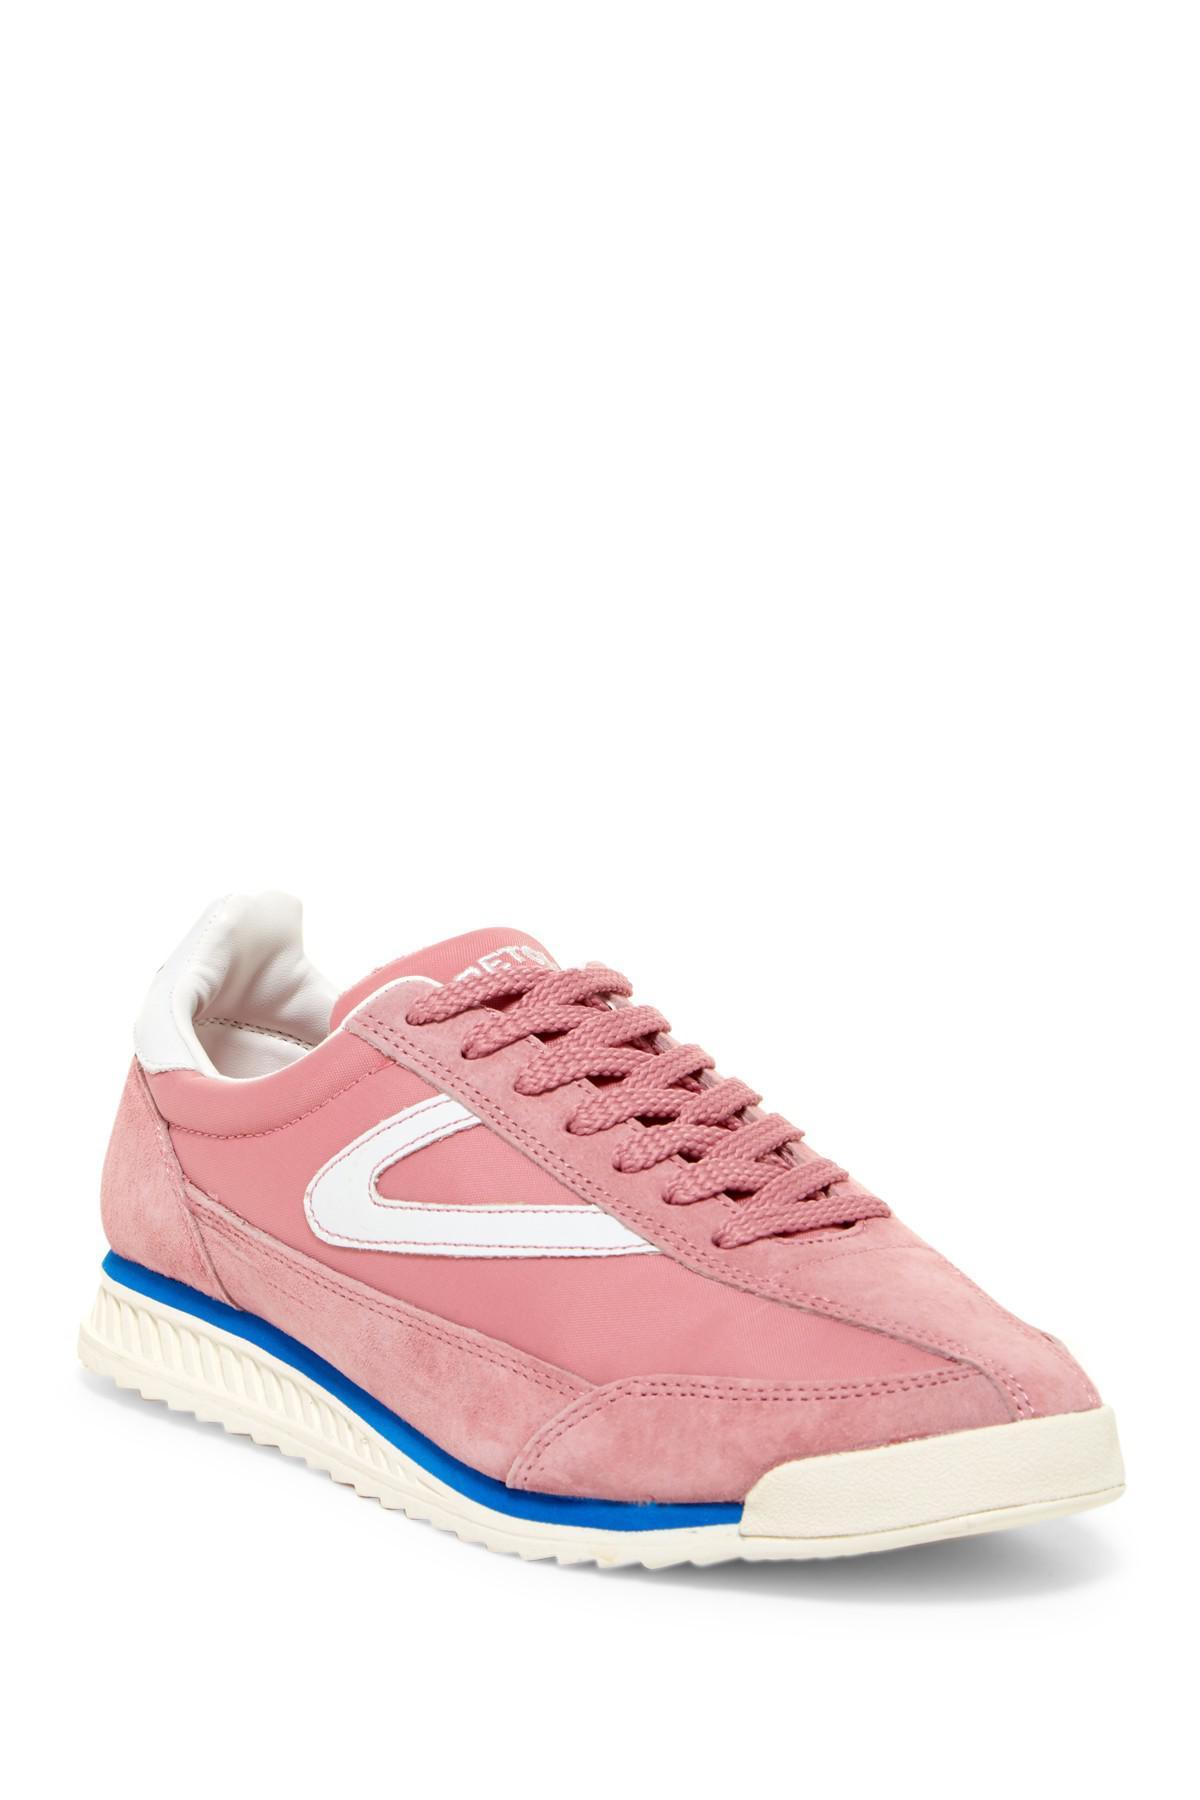 Tretorn Rawlins Sneaker In Pink Lyst